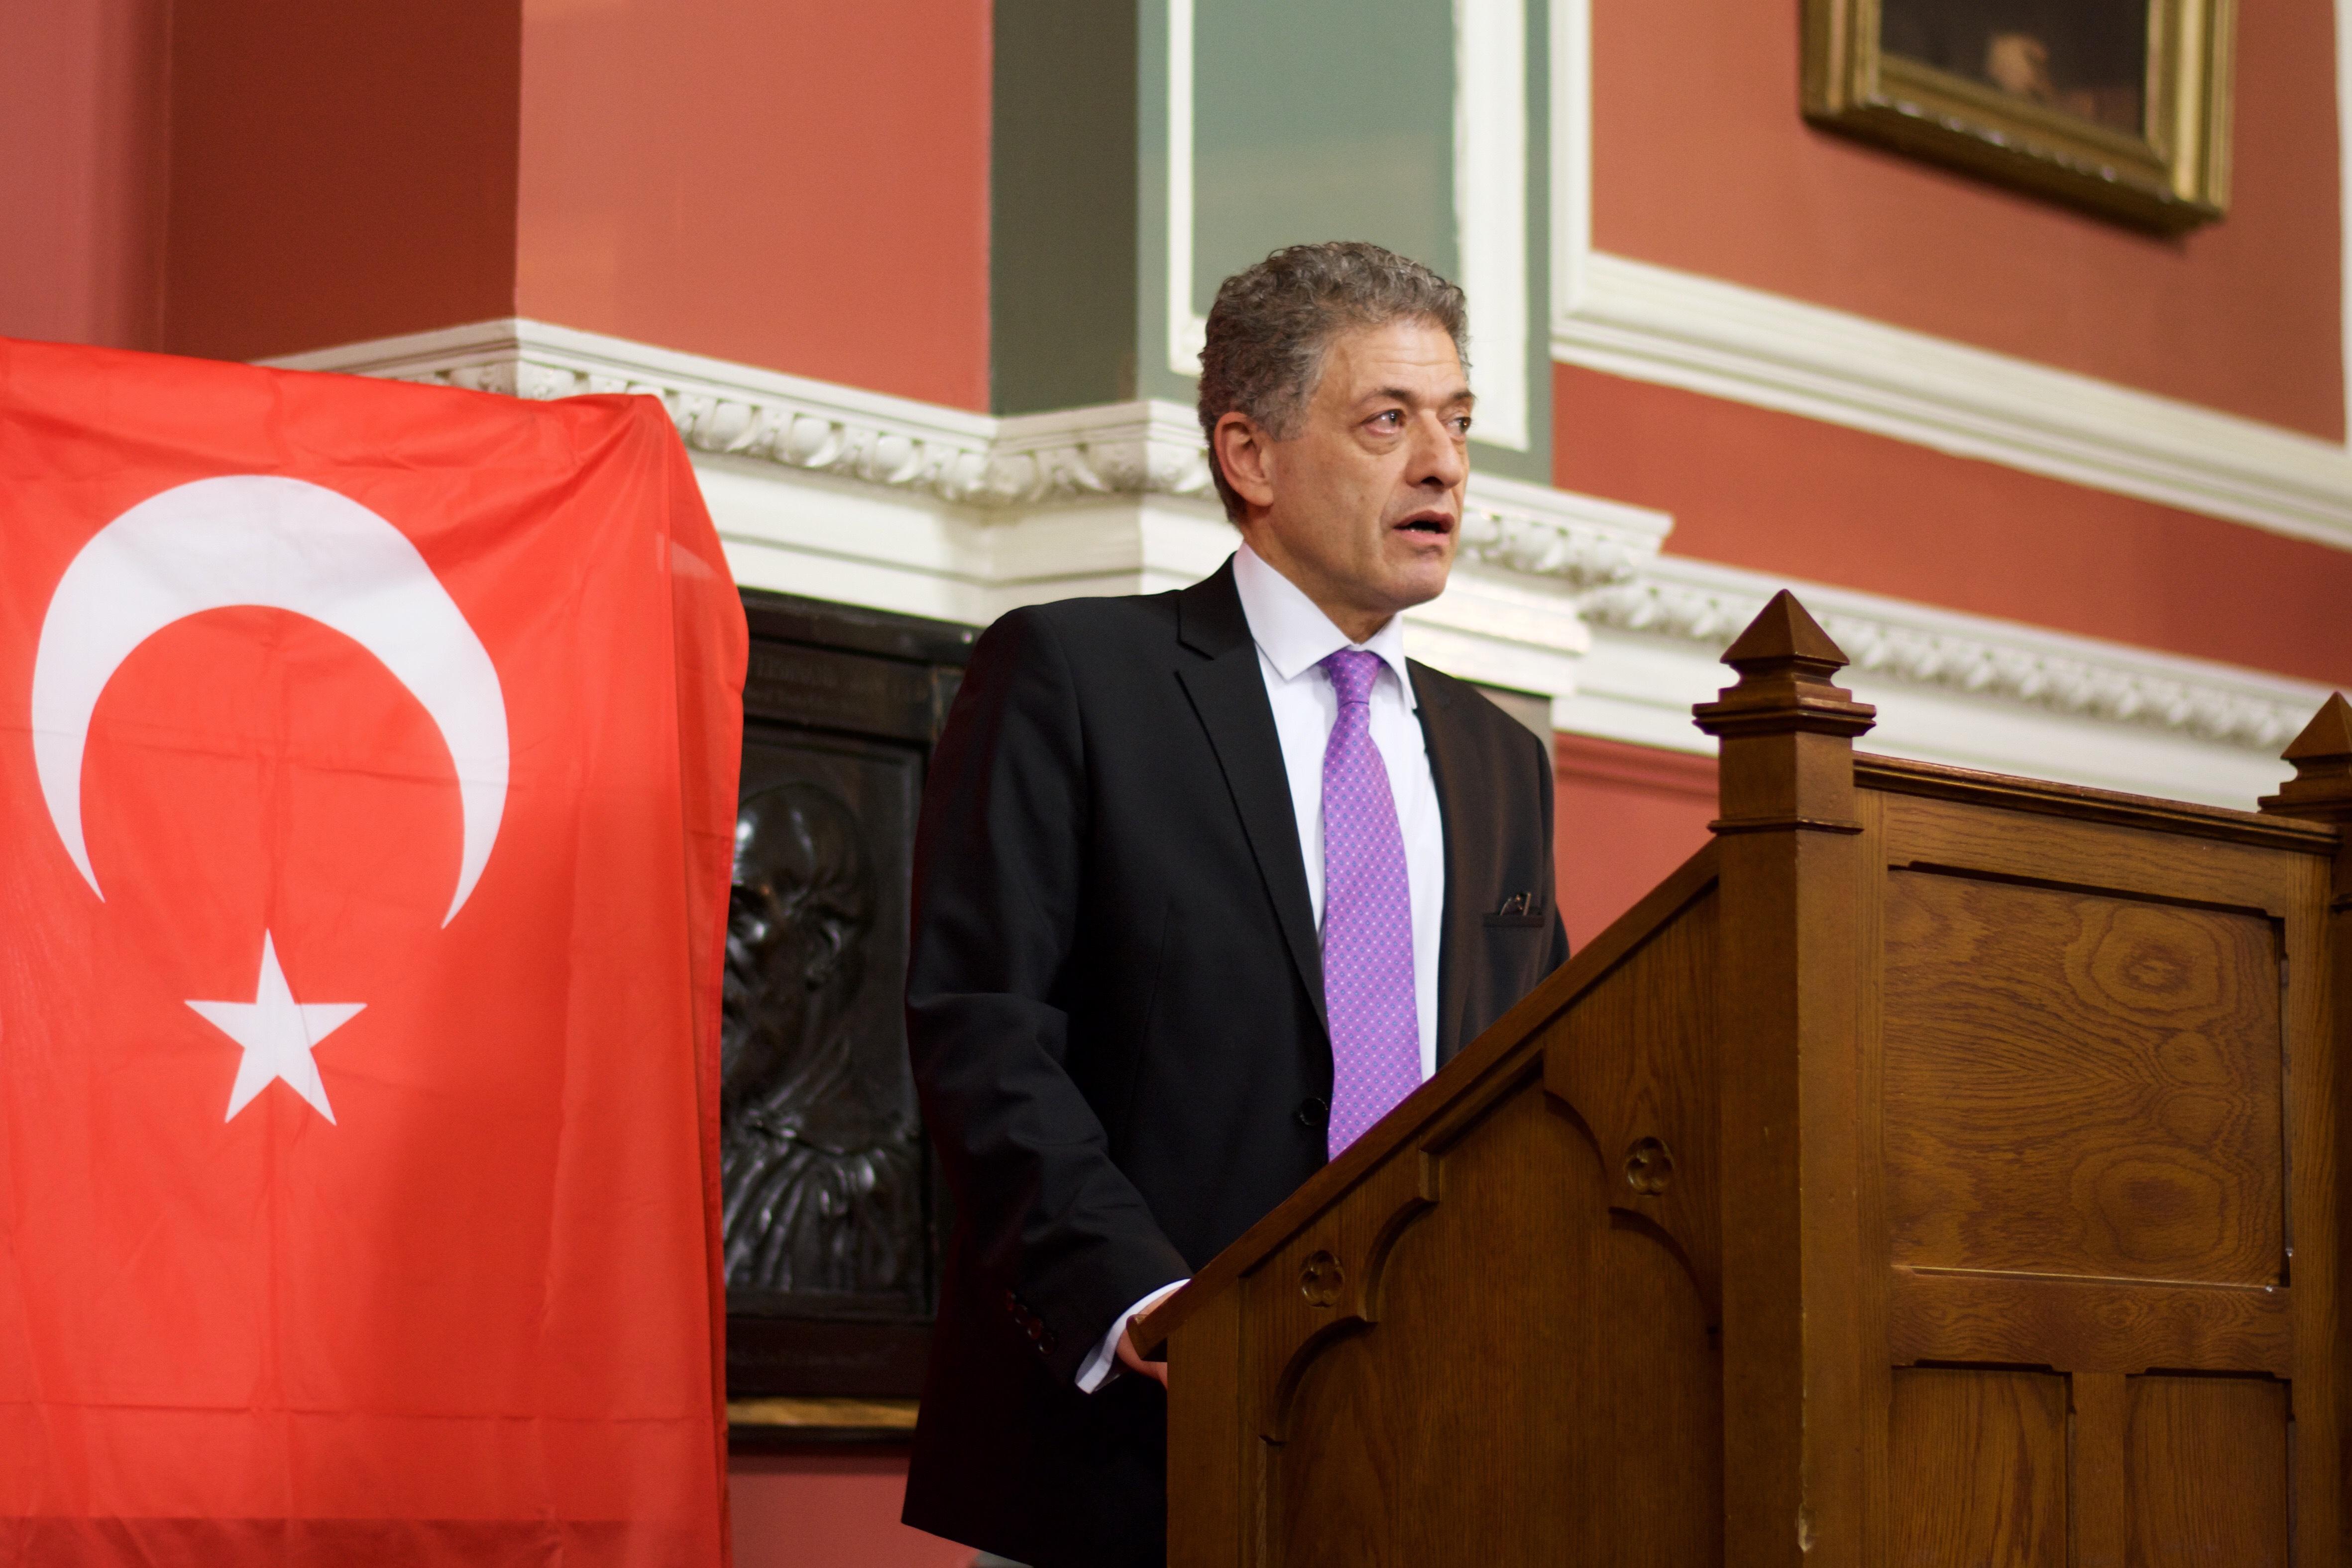 The terrorist organisation JCAG killed the Turkish ambassador's wife and brother